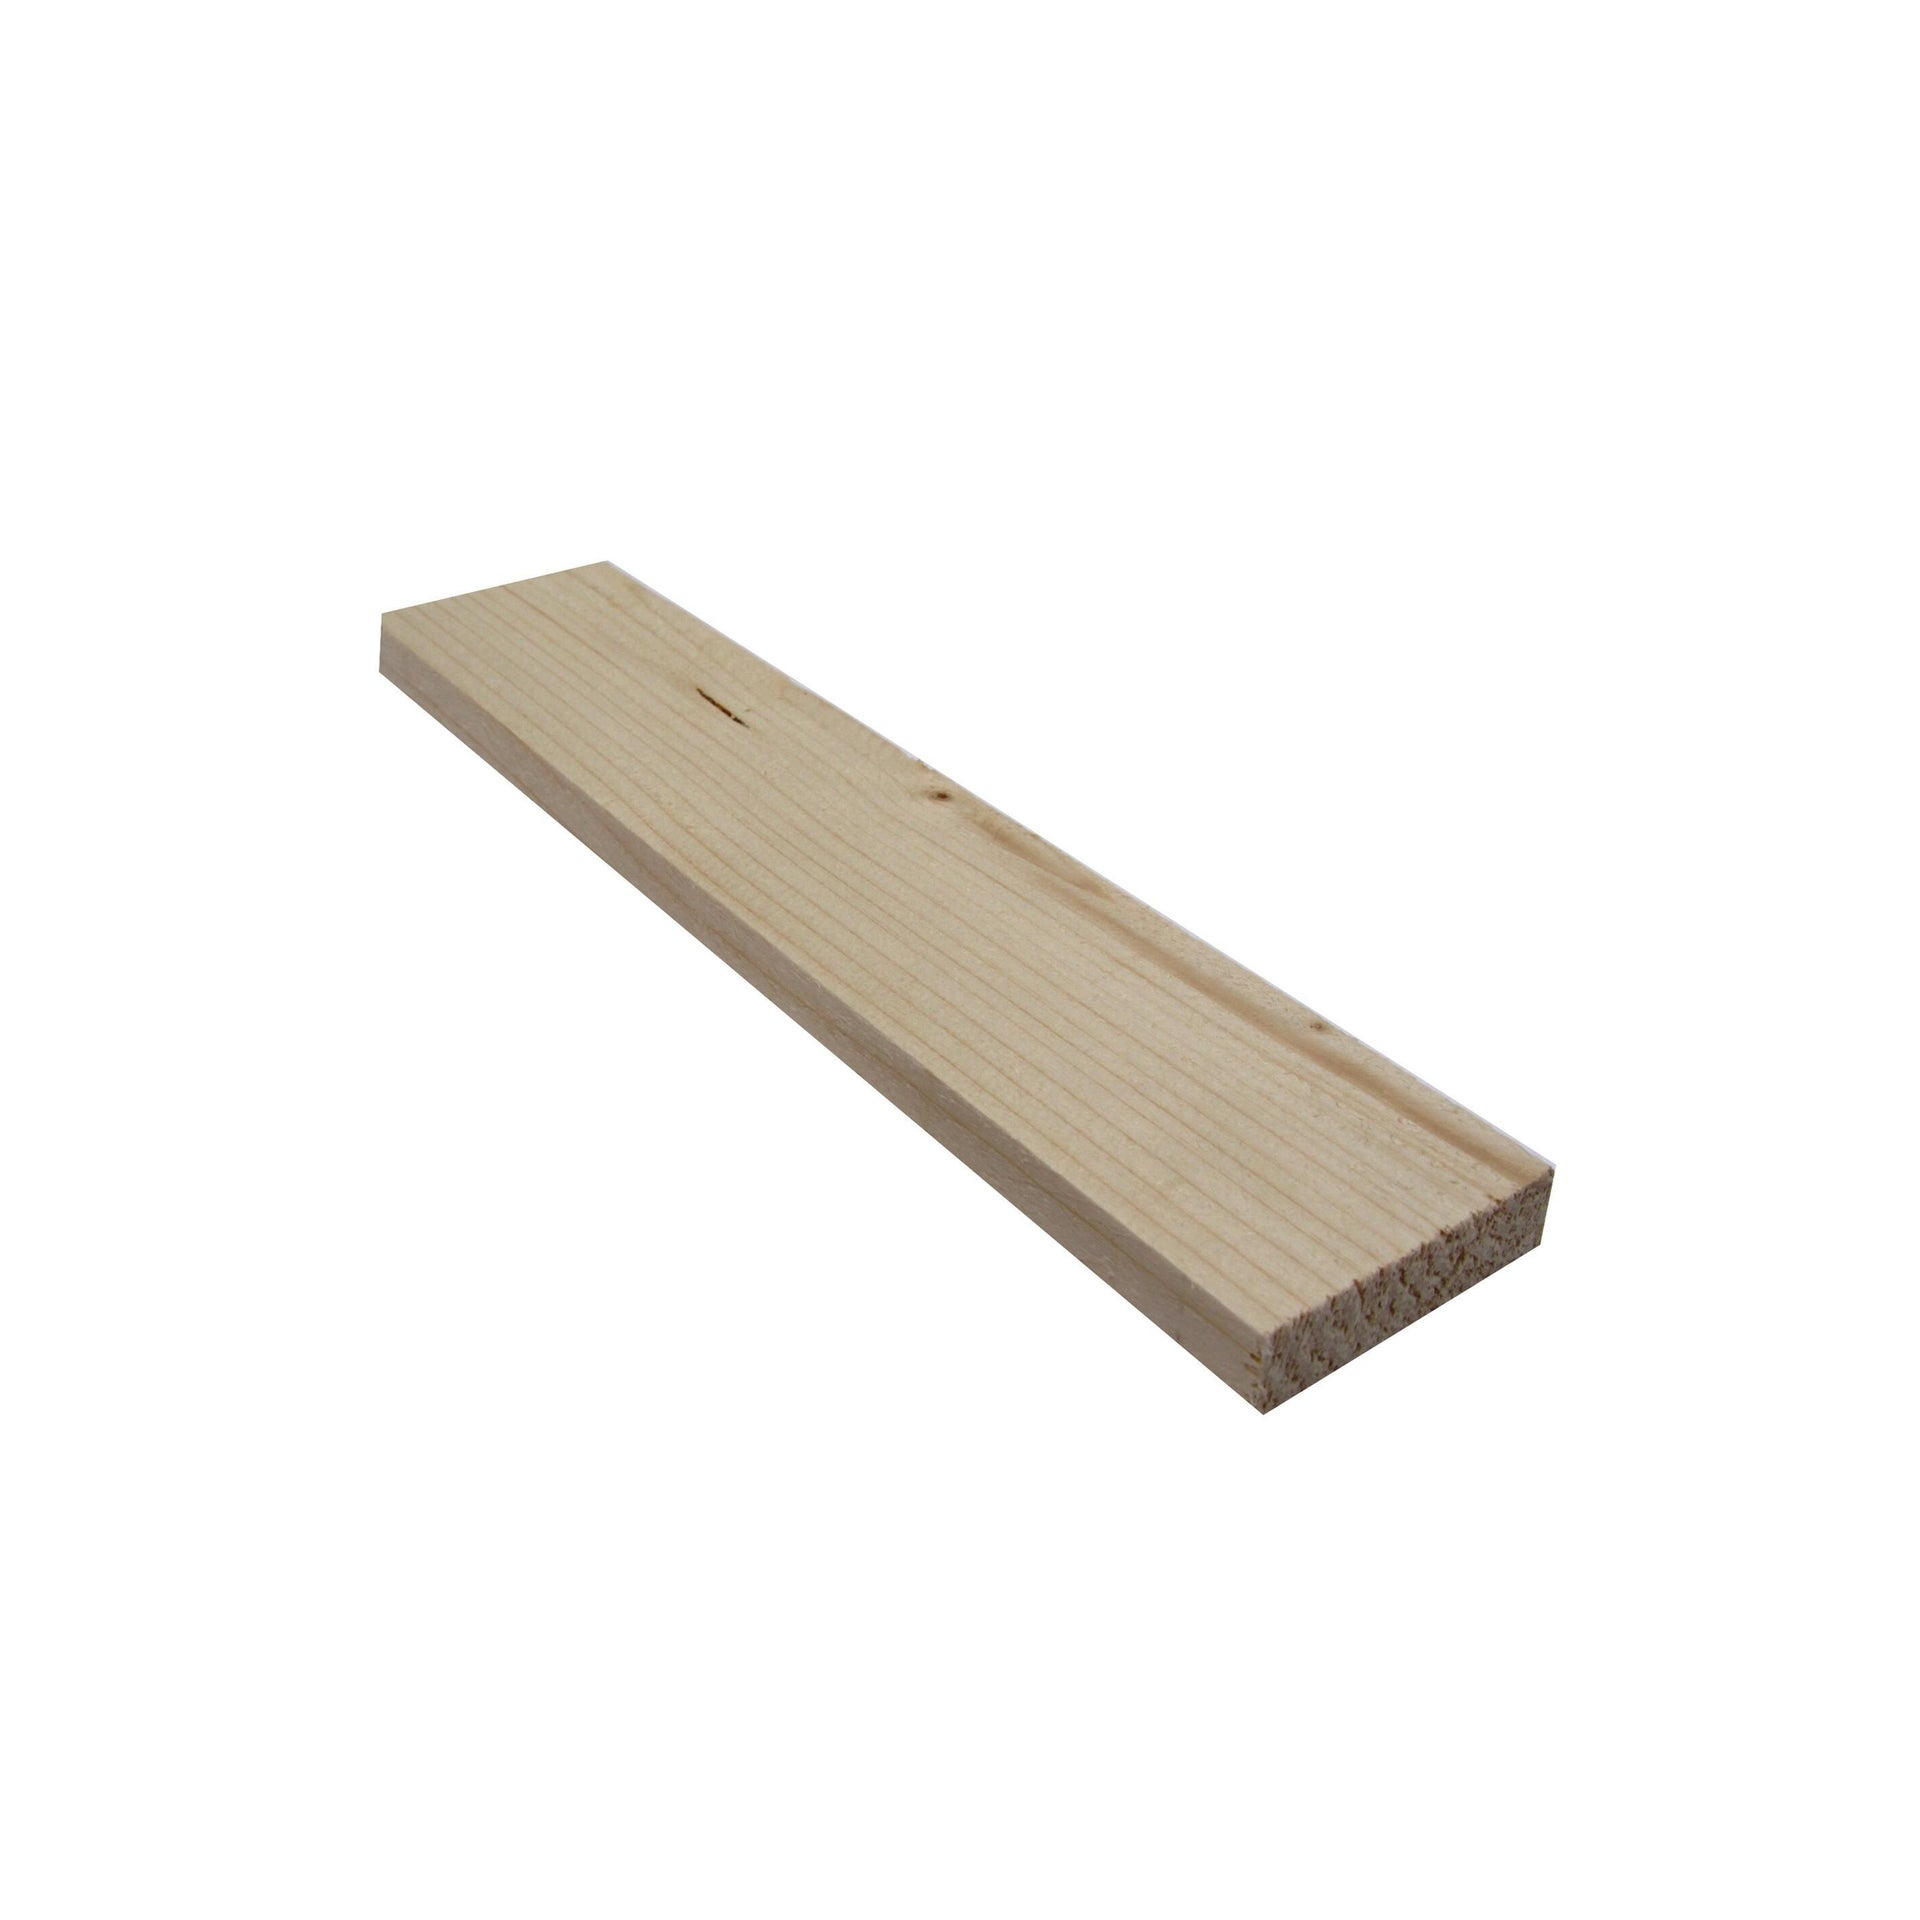 Listello grezzo abete 2 m x 50 mm, Sp 10 mm